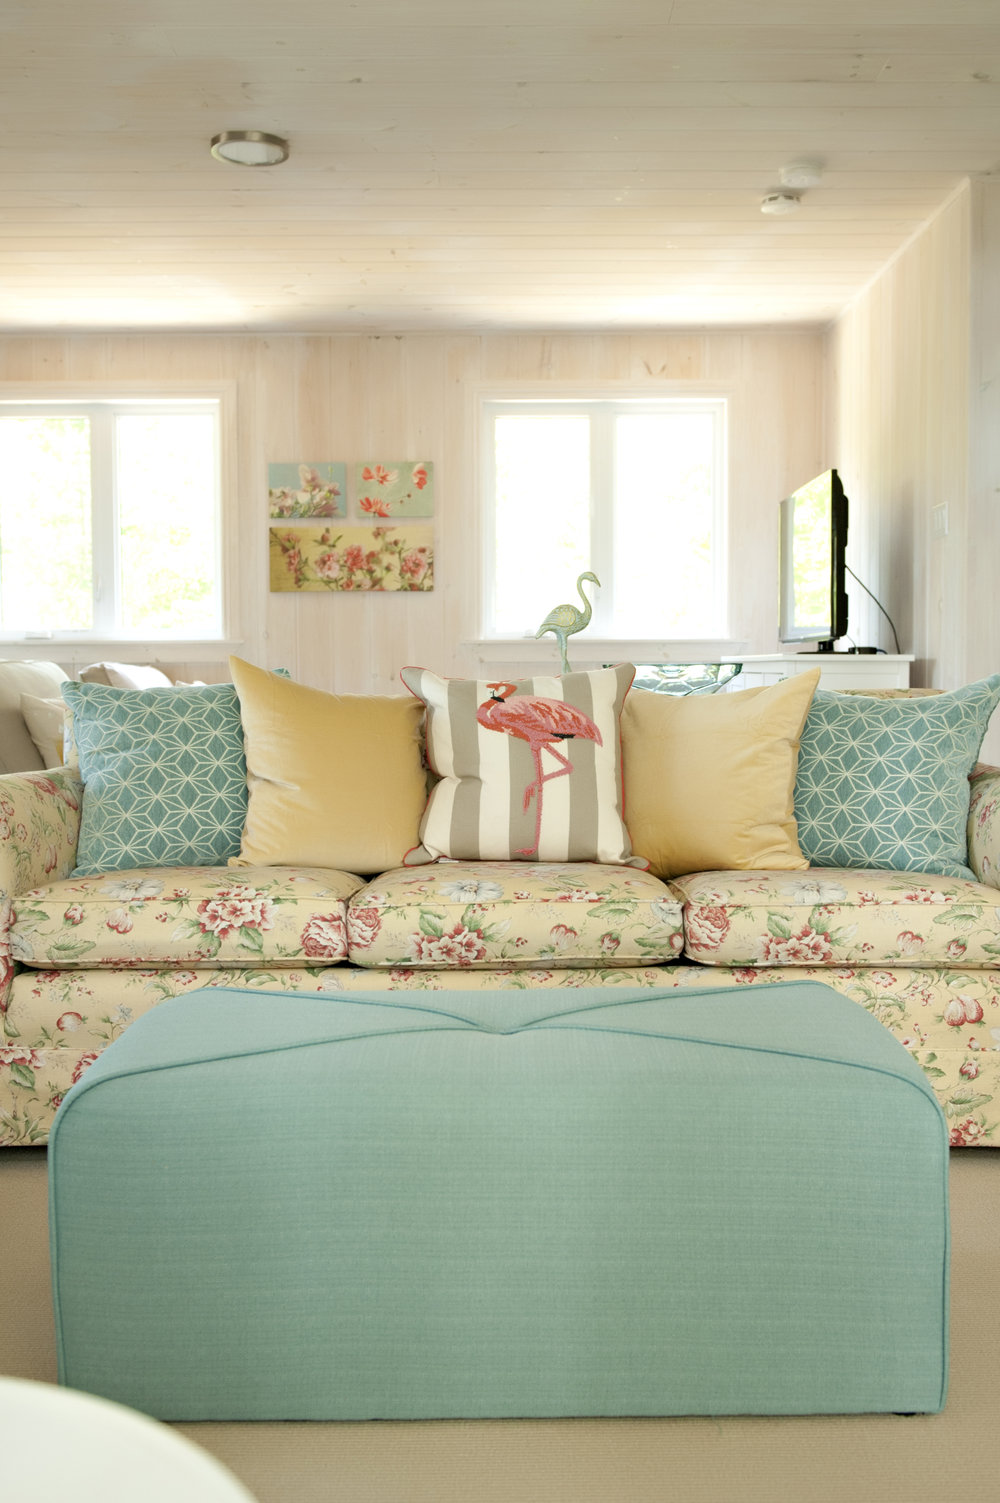 Candace-Plotz-Design-Beach-House-1